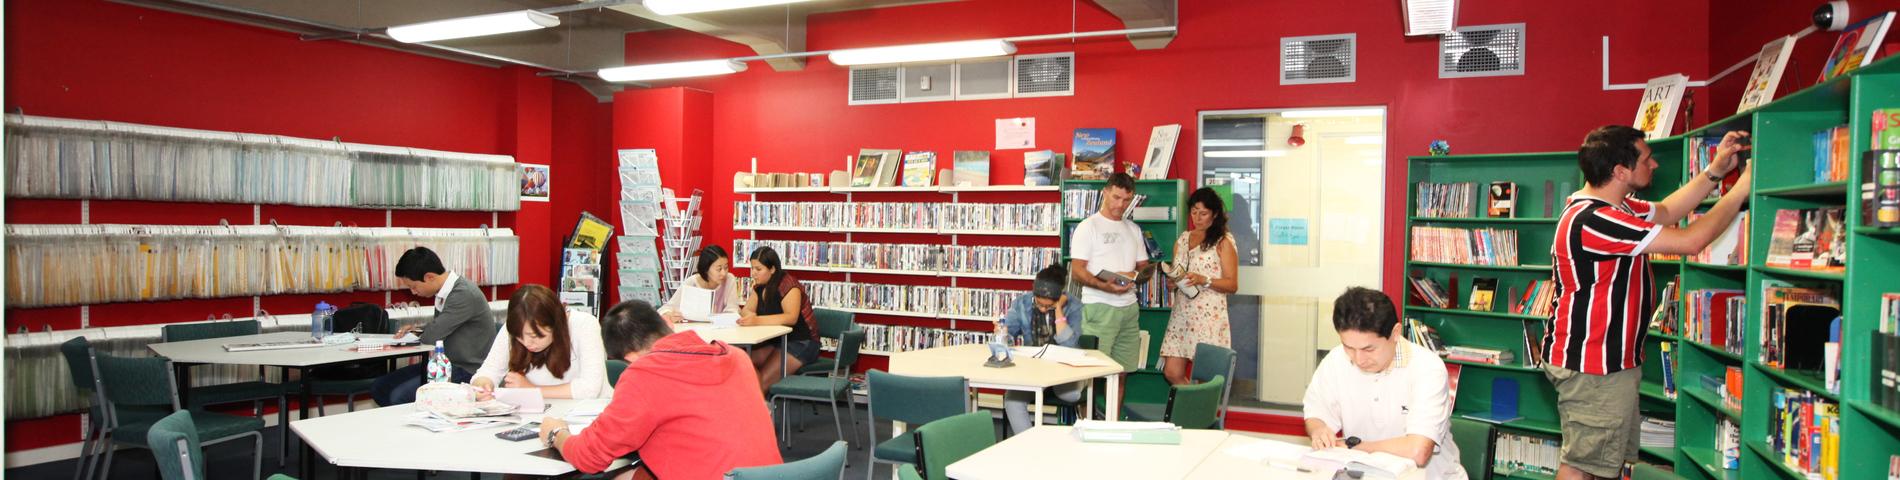 Worldwide School of English immagine 1